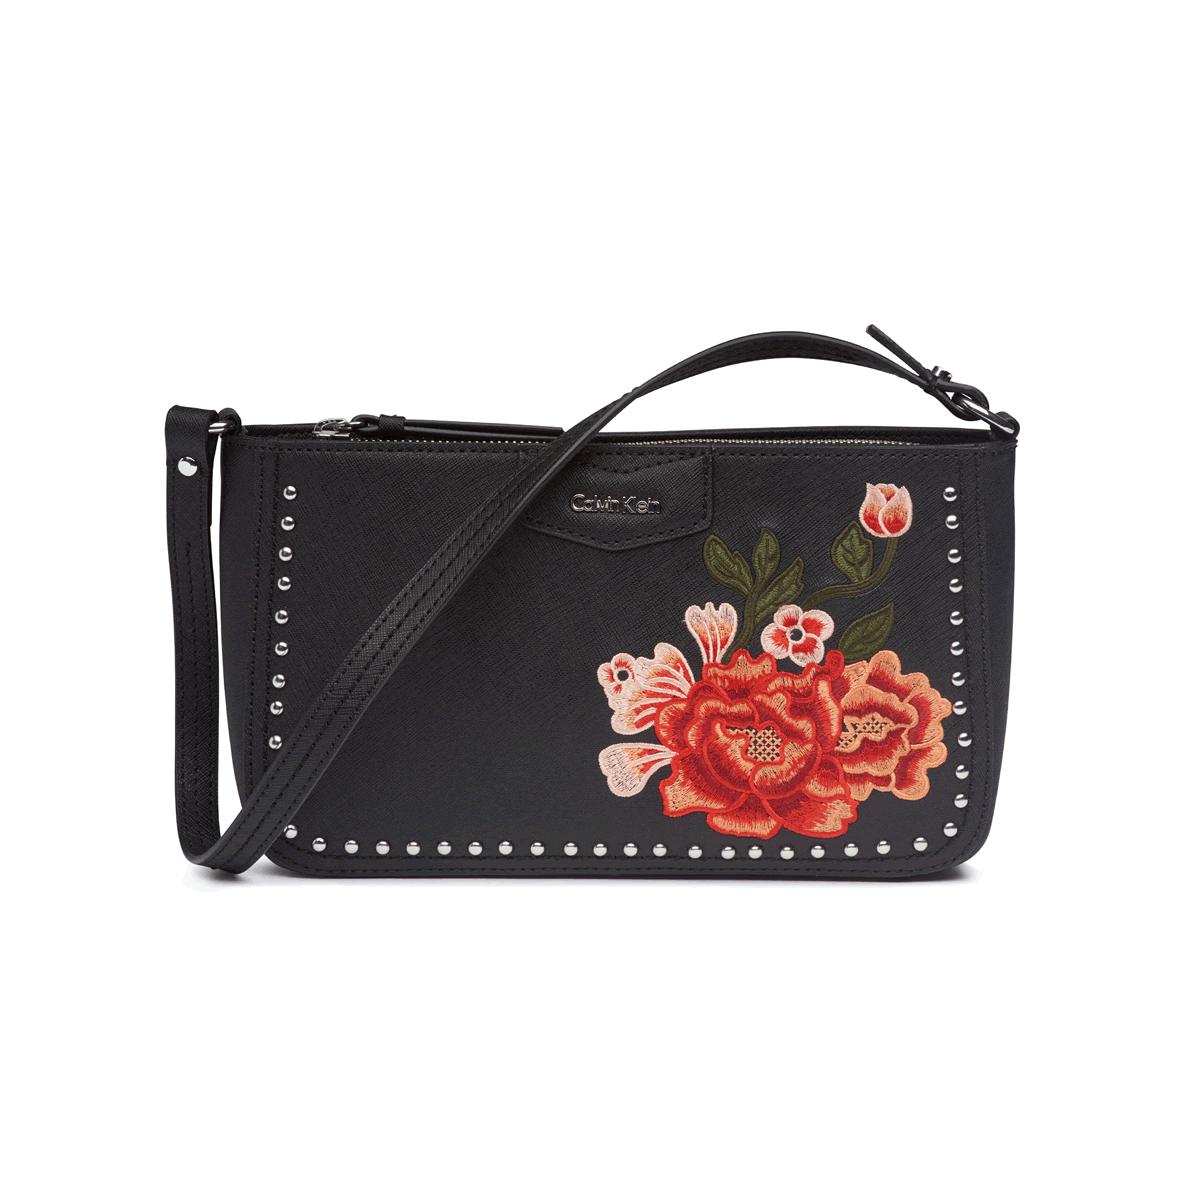 Calvin Klein Handbags   Bags - Macy s 4bb84075c0